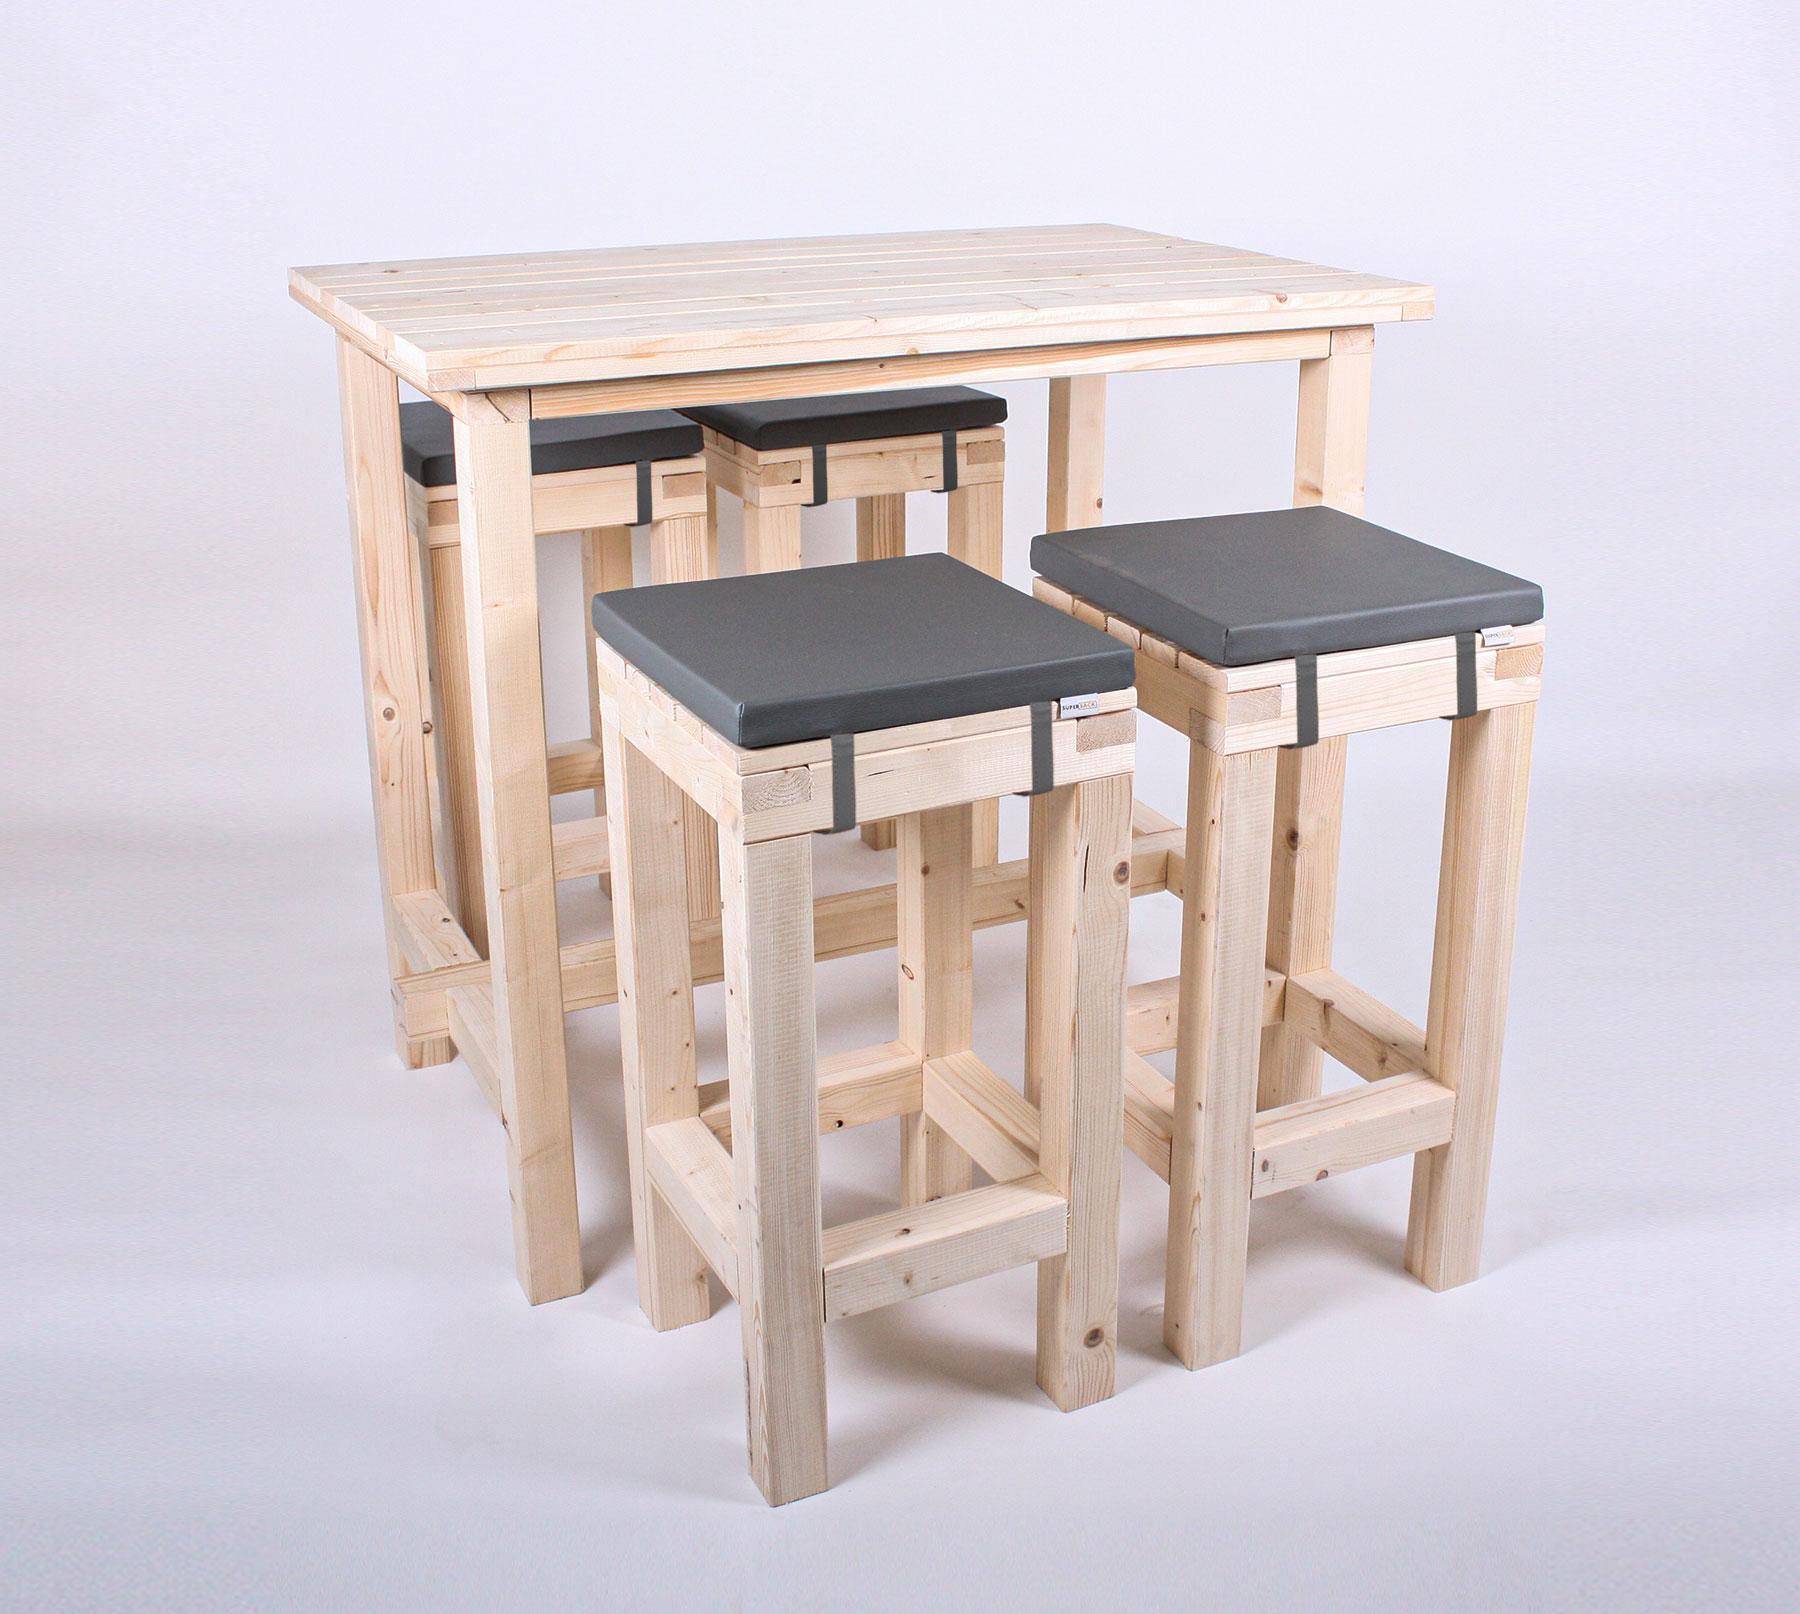 Stehgarnitur Komfort 4 Personen Tisch 120cm Supersack De